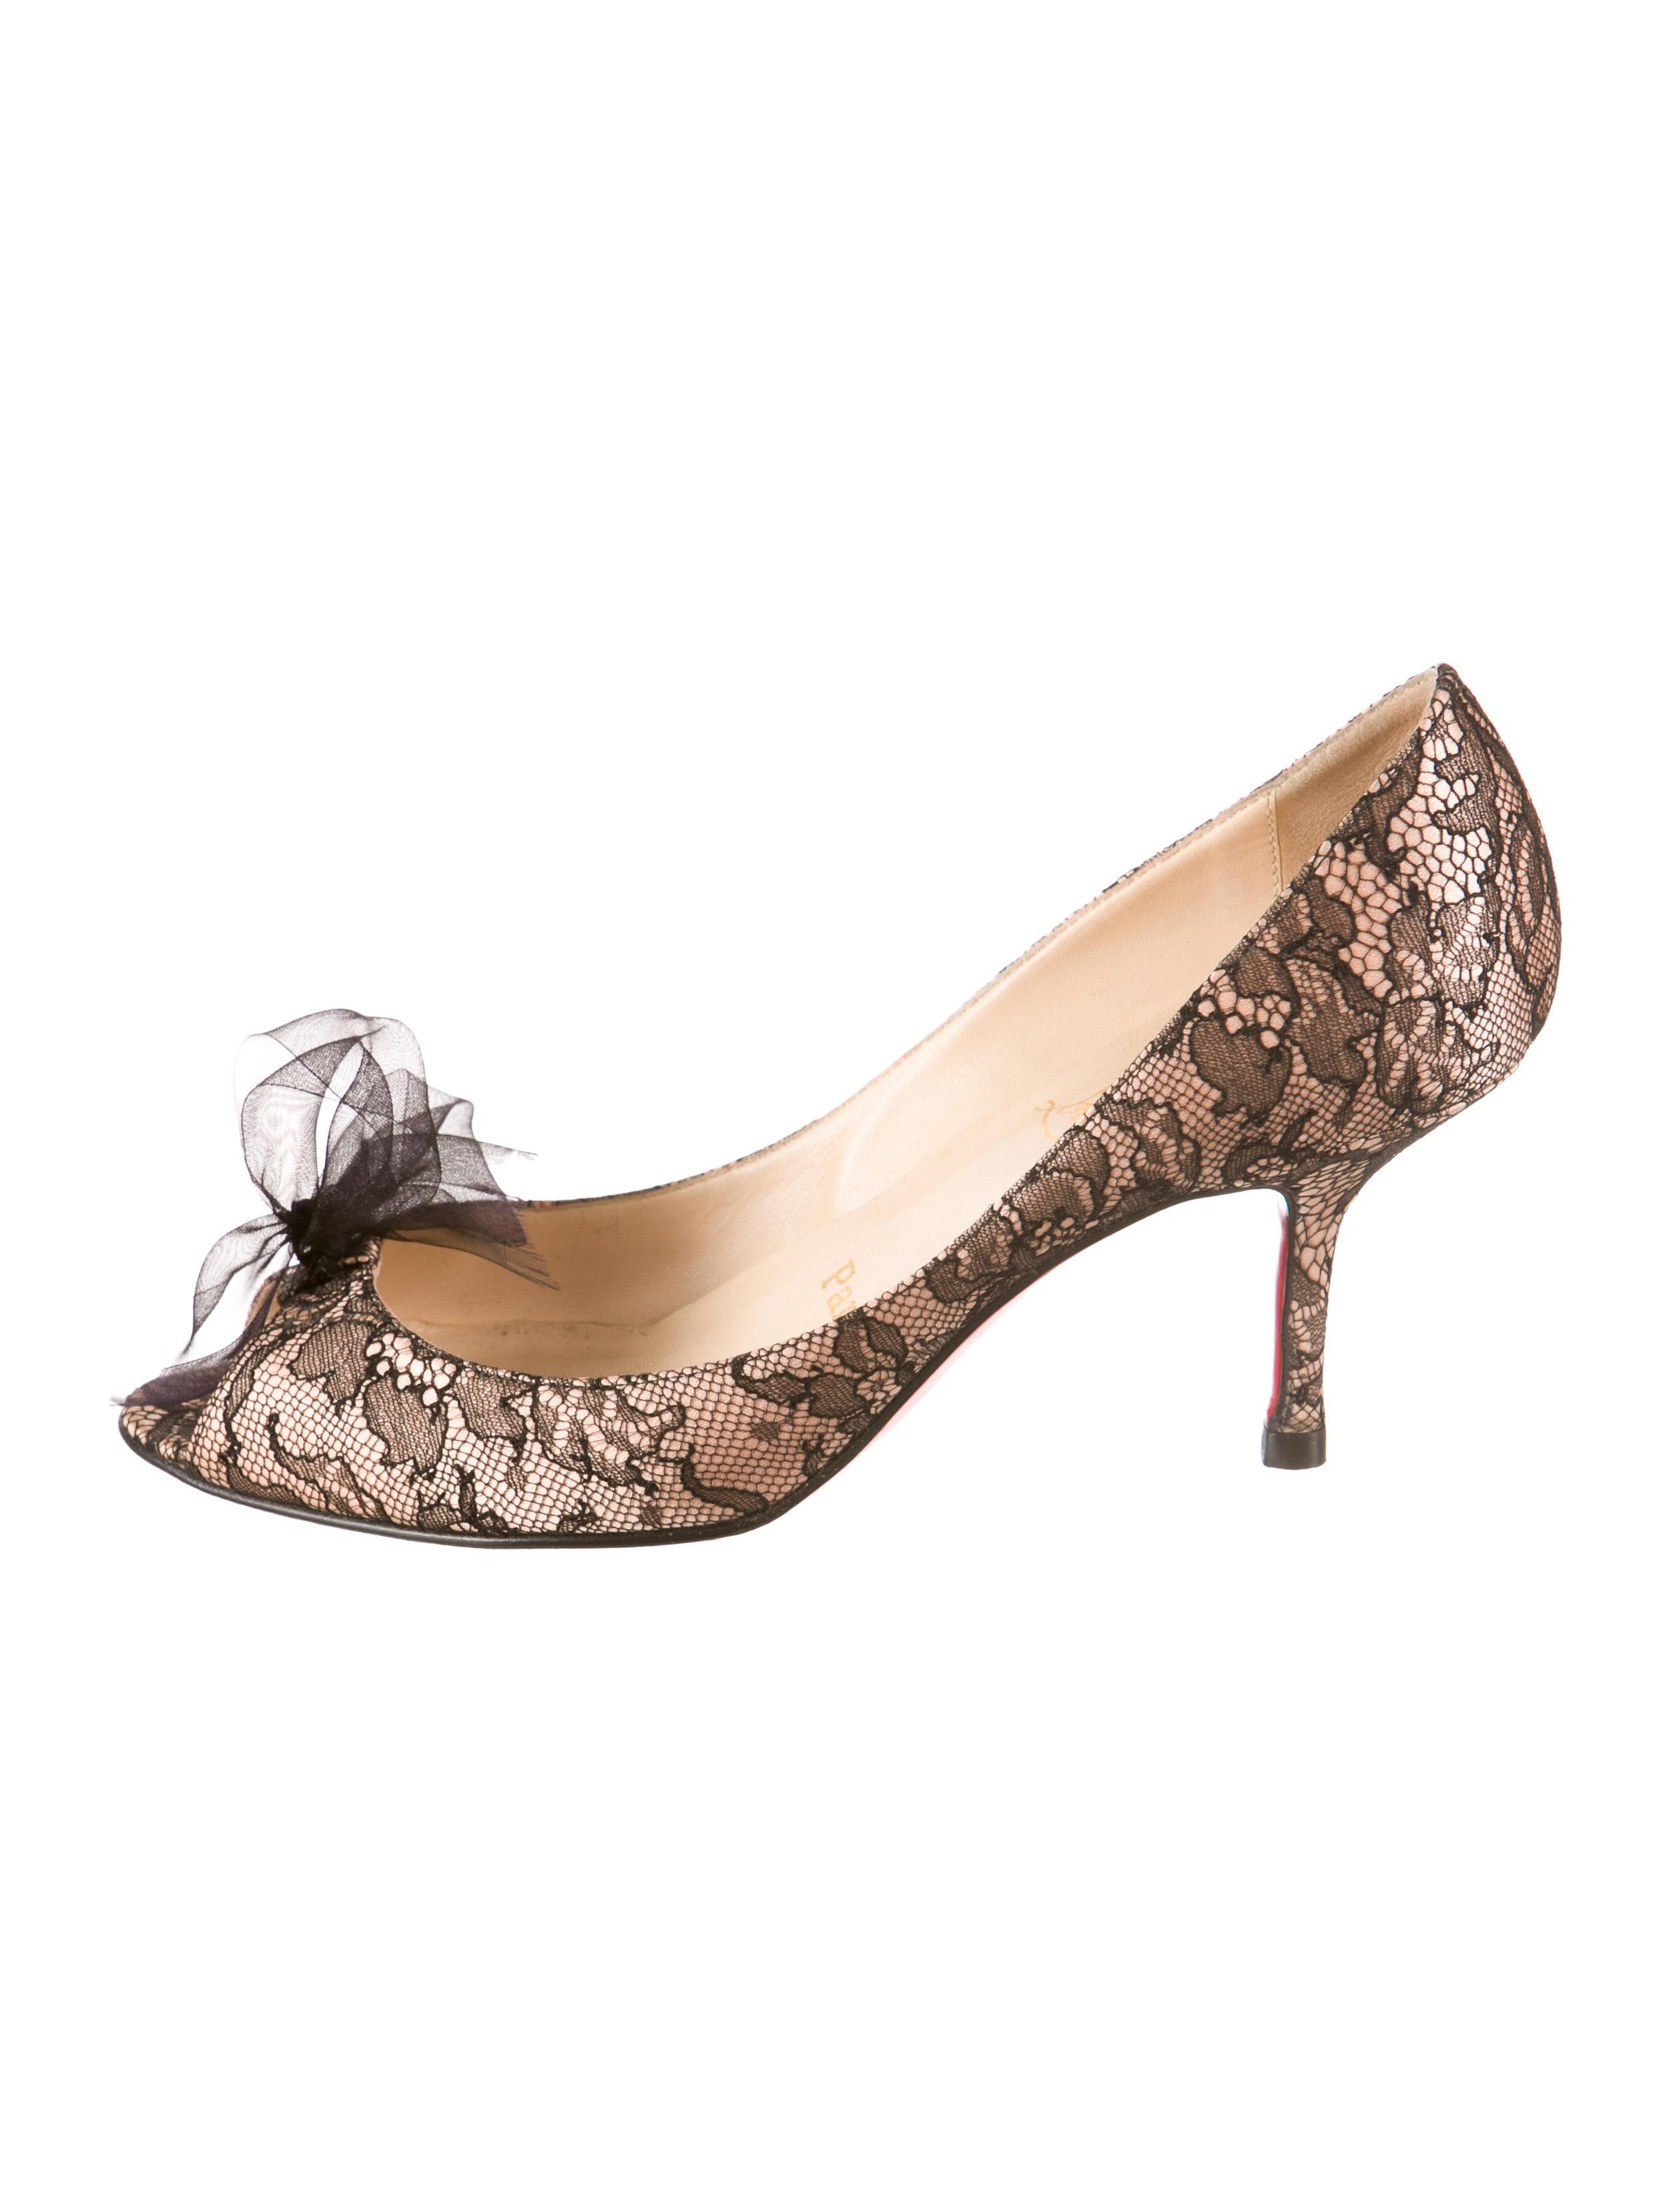 counterfeit christian louboutin shoes - Artesur ? christian louboutin satin pumps Nude and black lace overlay